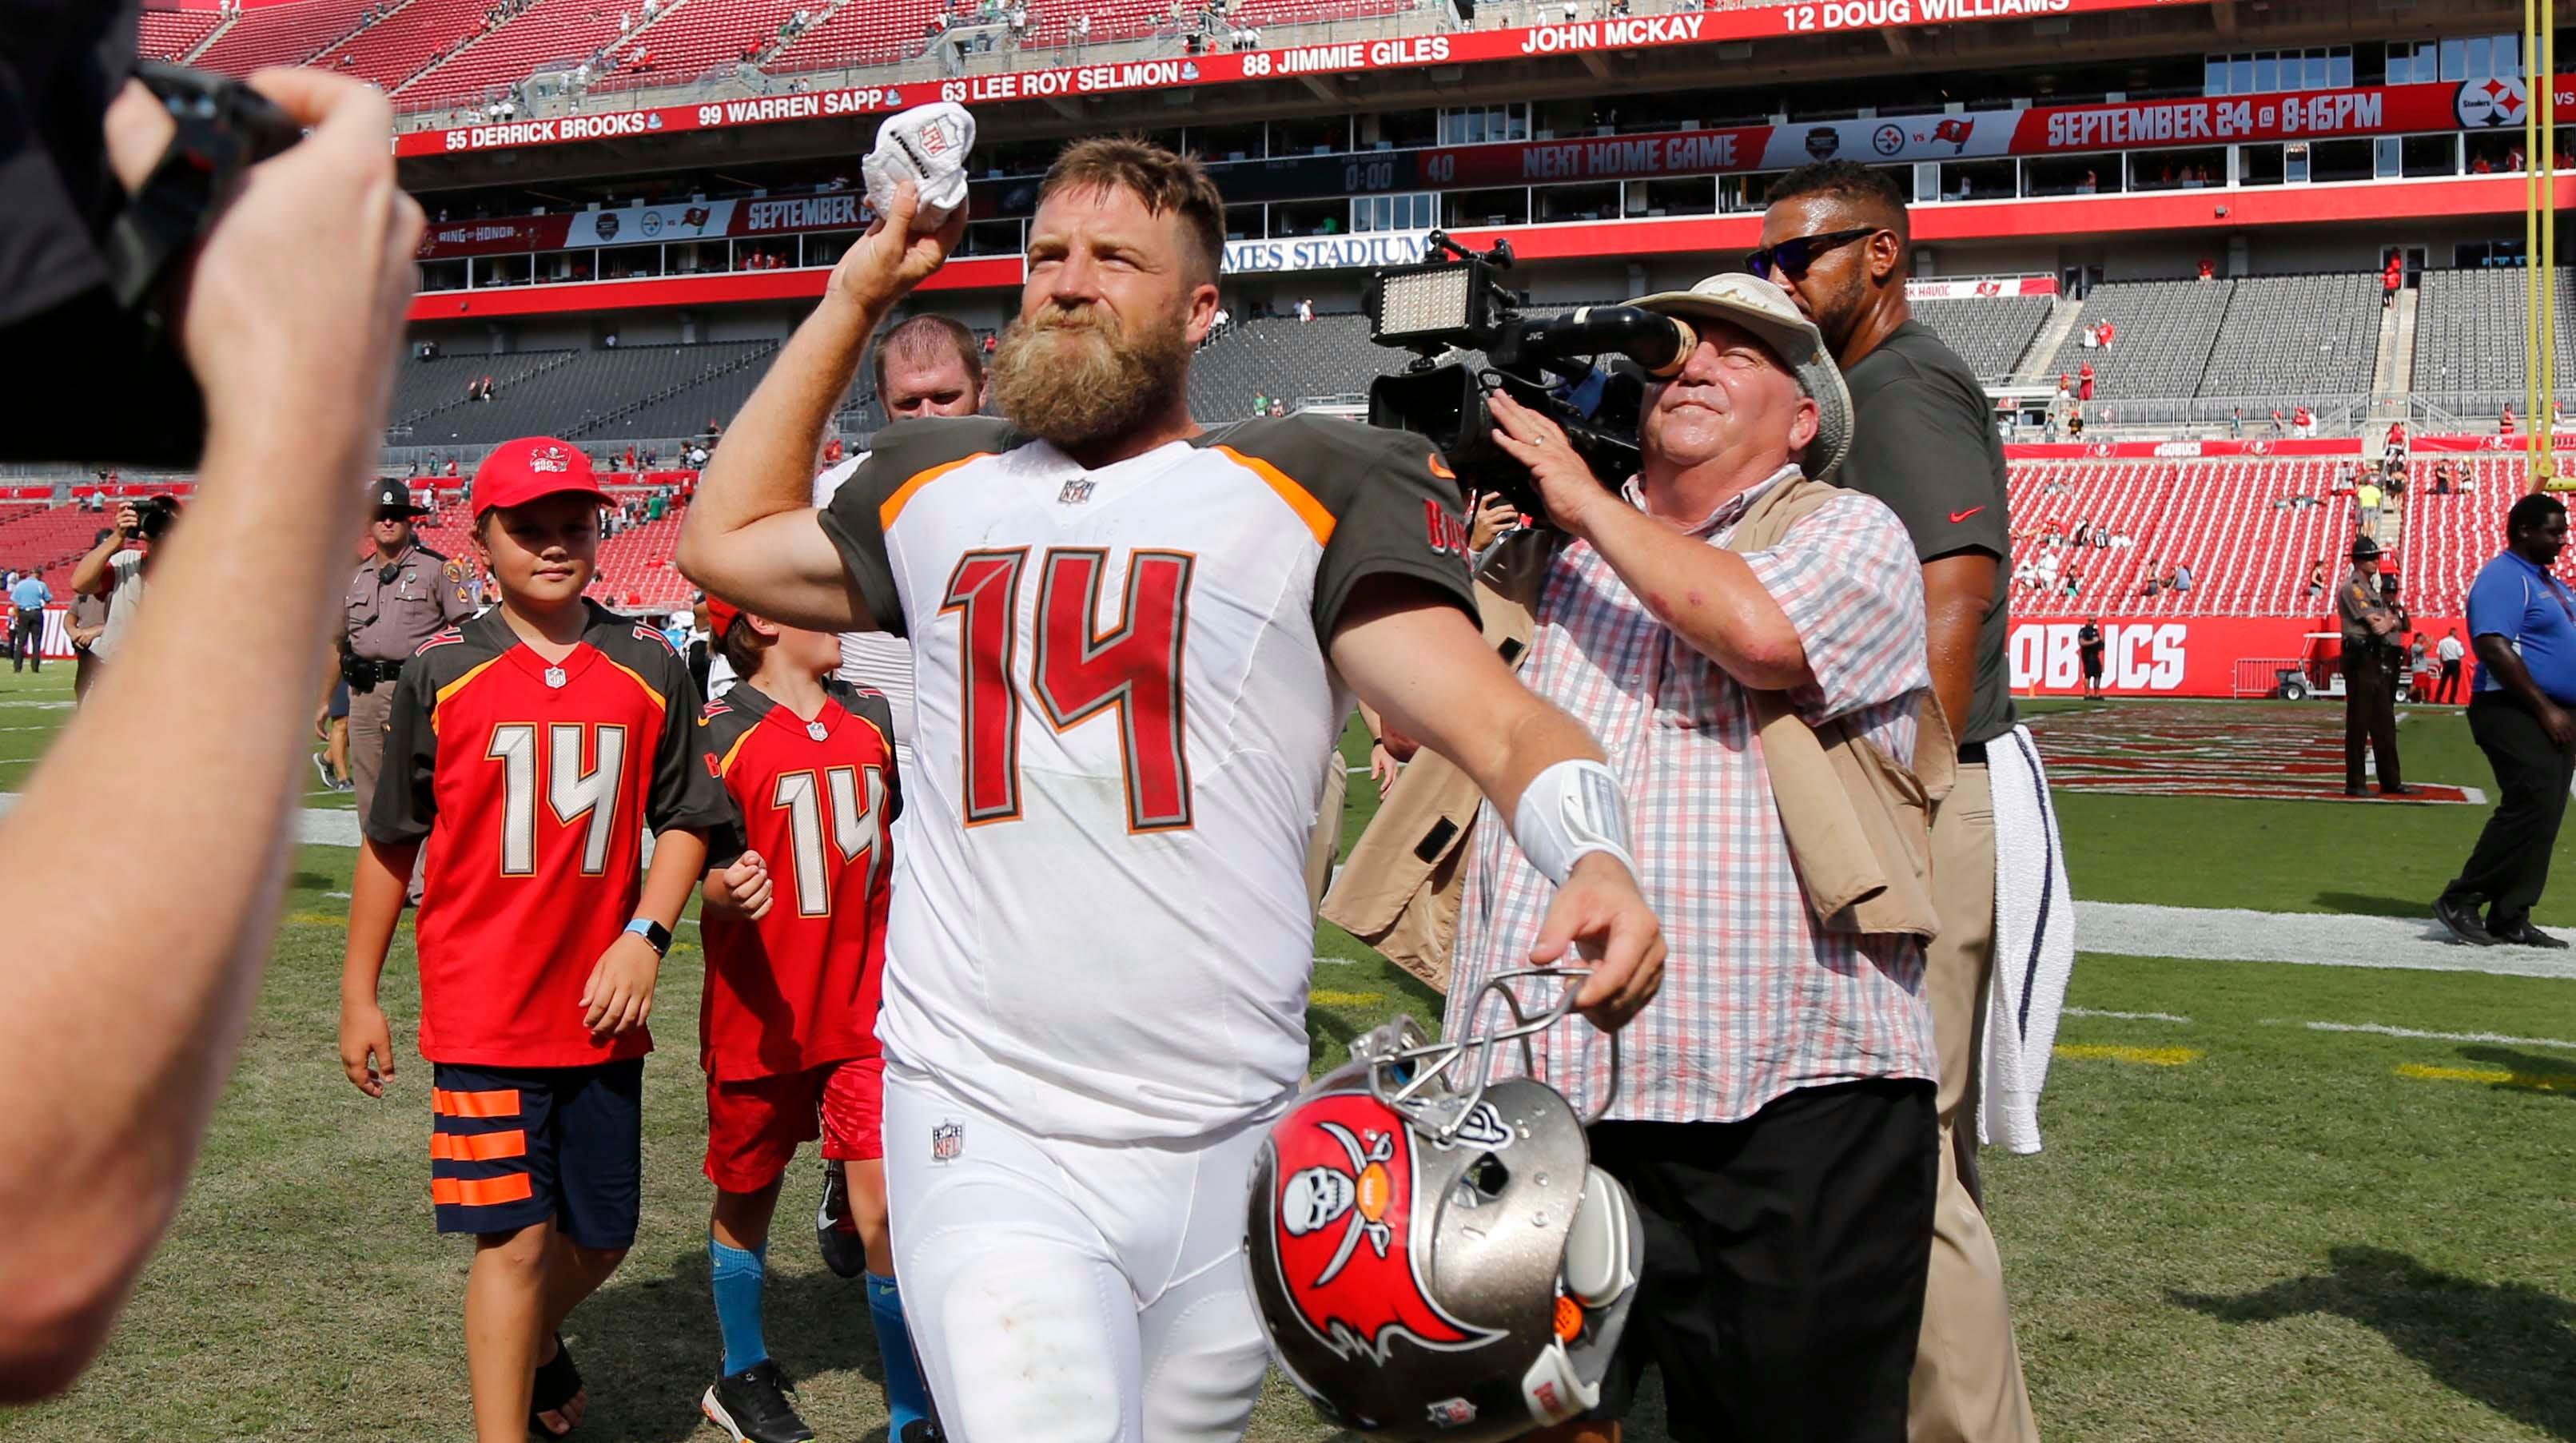 Arizona quarterbacks in NFL: Buccaneers' Ryan Fitzpatrick extends touchdown record